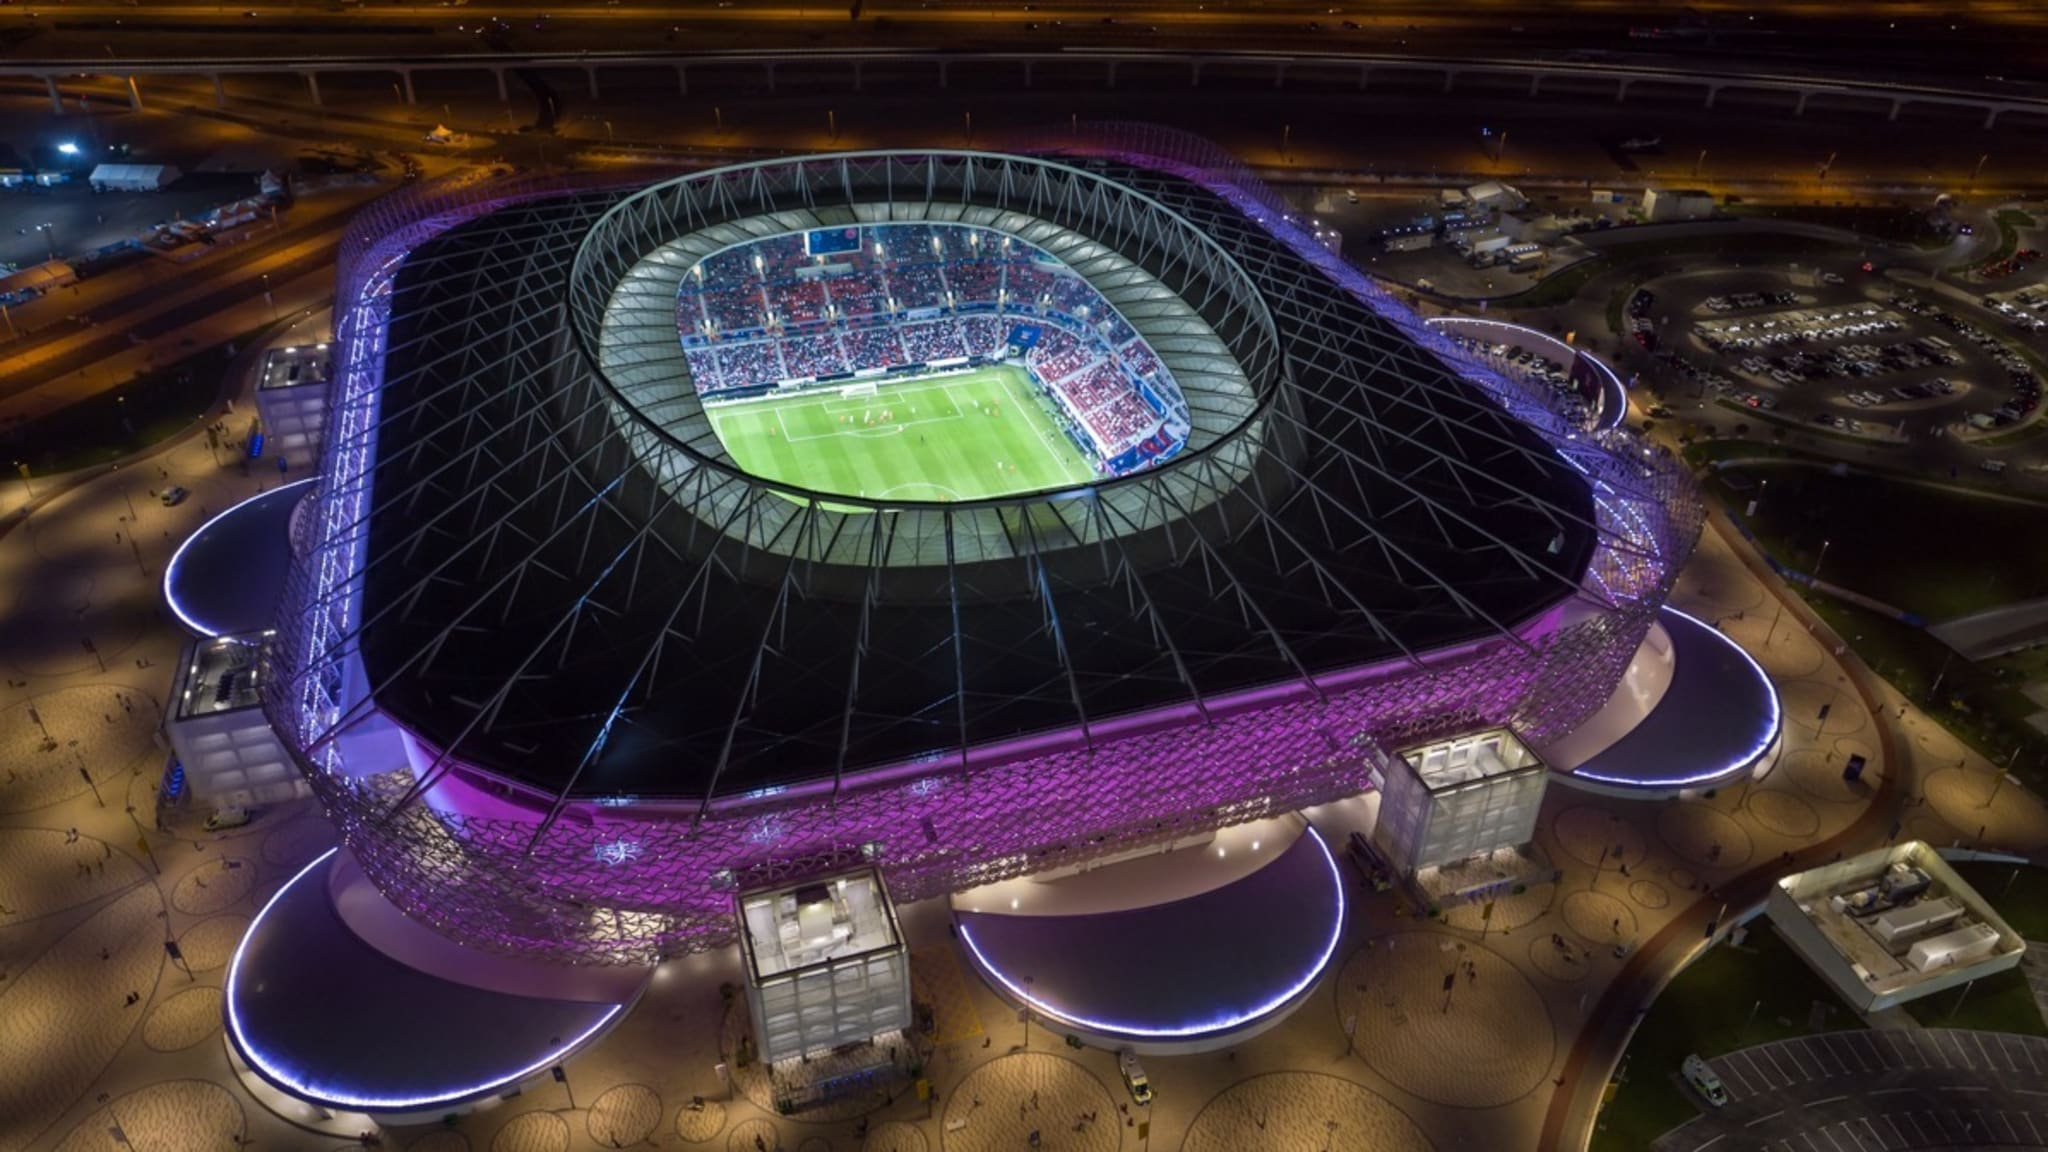 stadion Ahmad Bin Ali